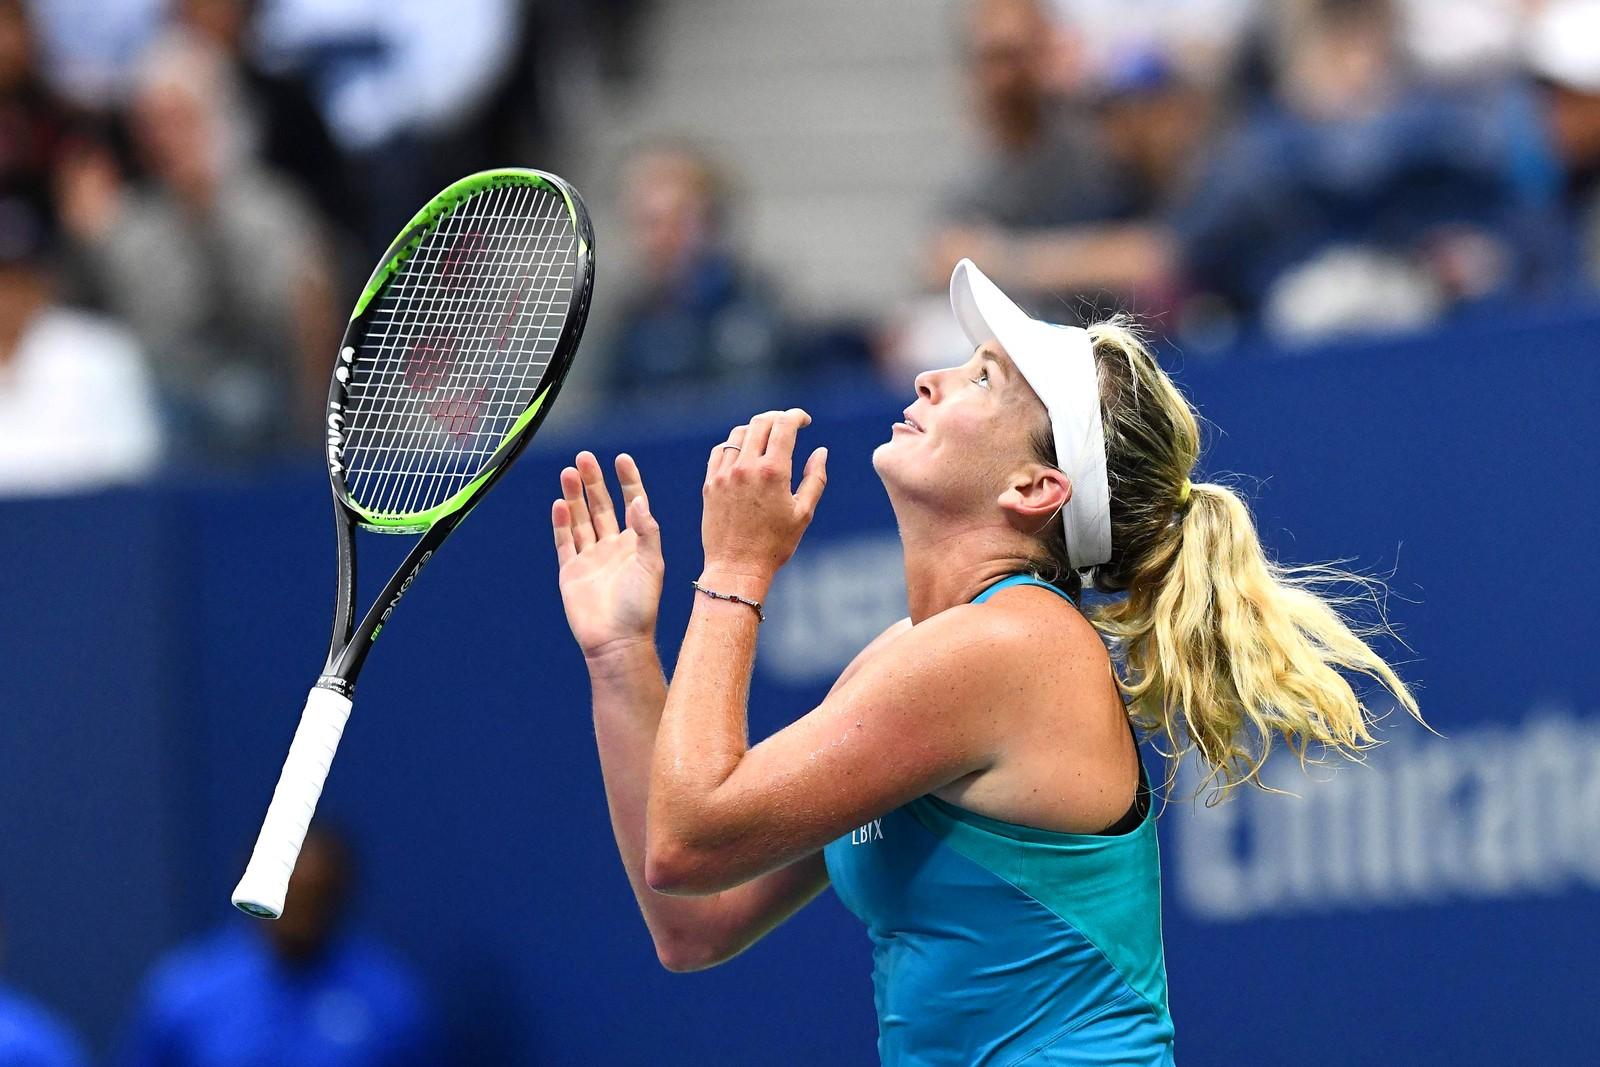 Vinnerglede. Amerikanske CoCo Vandeweghe har nettopp slått tsjekkiske Karolina Pliskova under U:S. Open i New York.